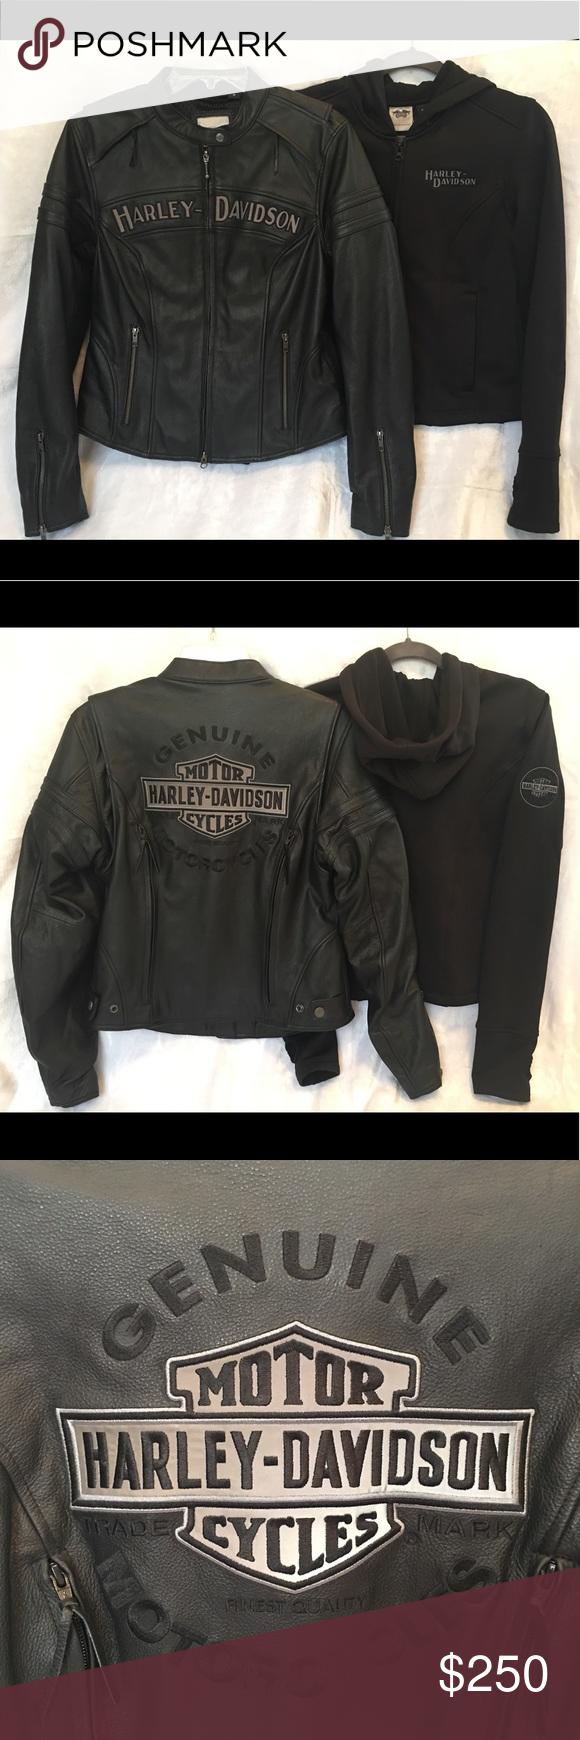 Harley Davidson Women S 3 In 1 Leather Jacket Leather Jackets Women Harley Davidson Women Leather Jacket [ 1740 x 580 Pixel ]